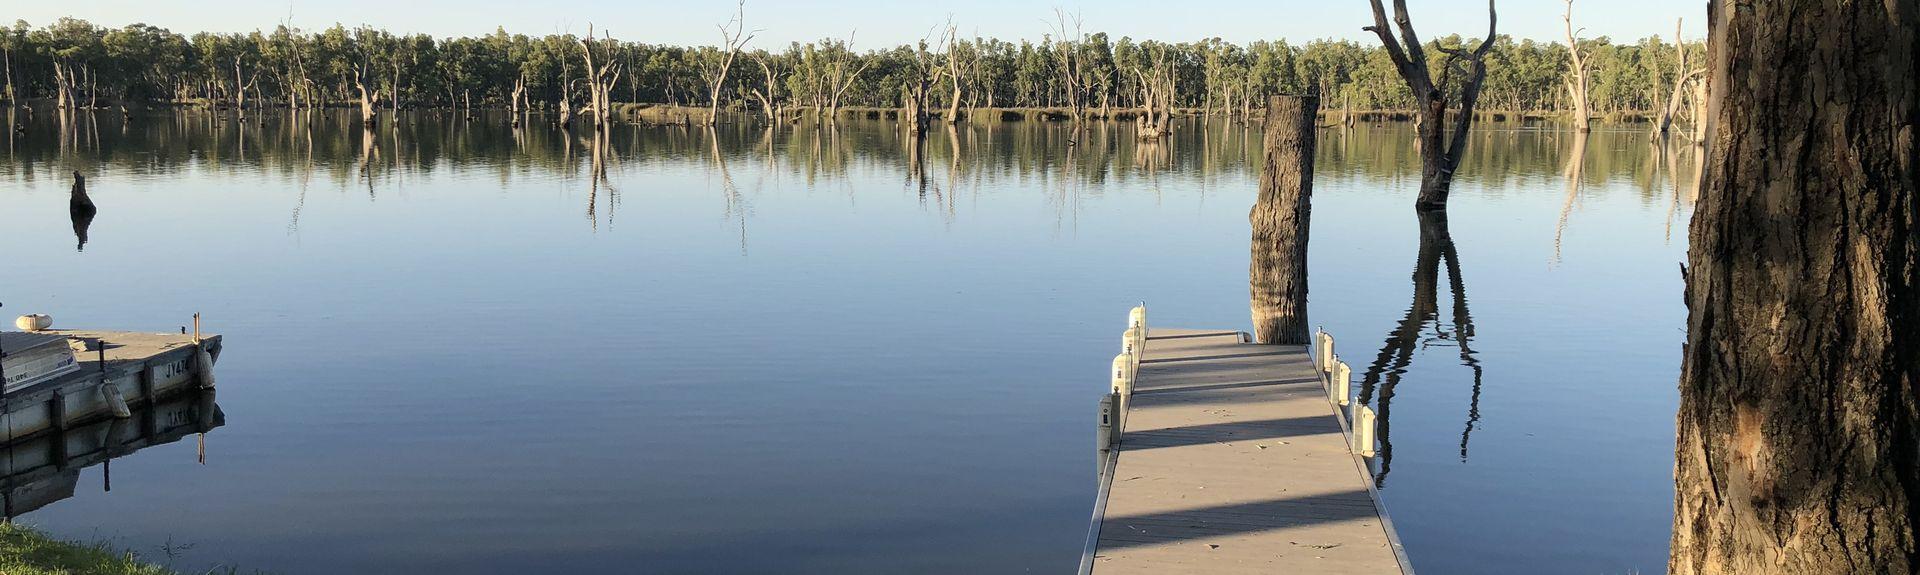 Corowa, New South Wales, Australien